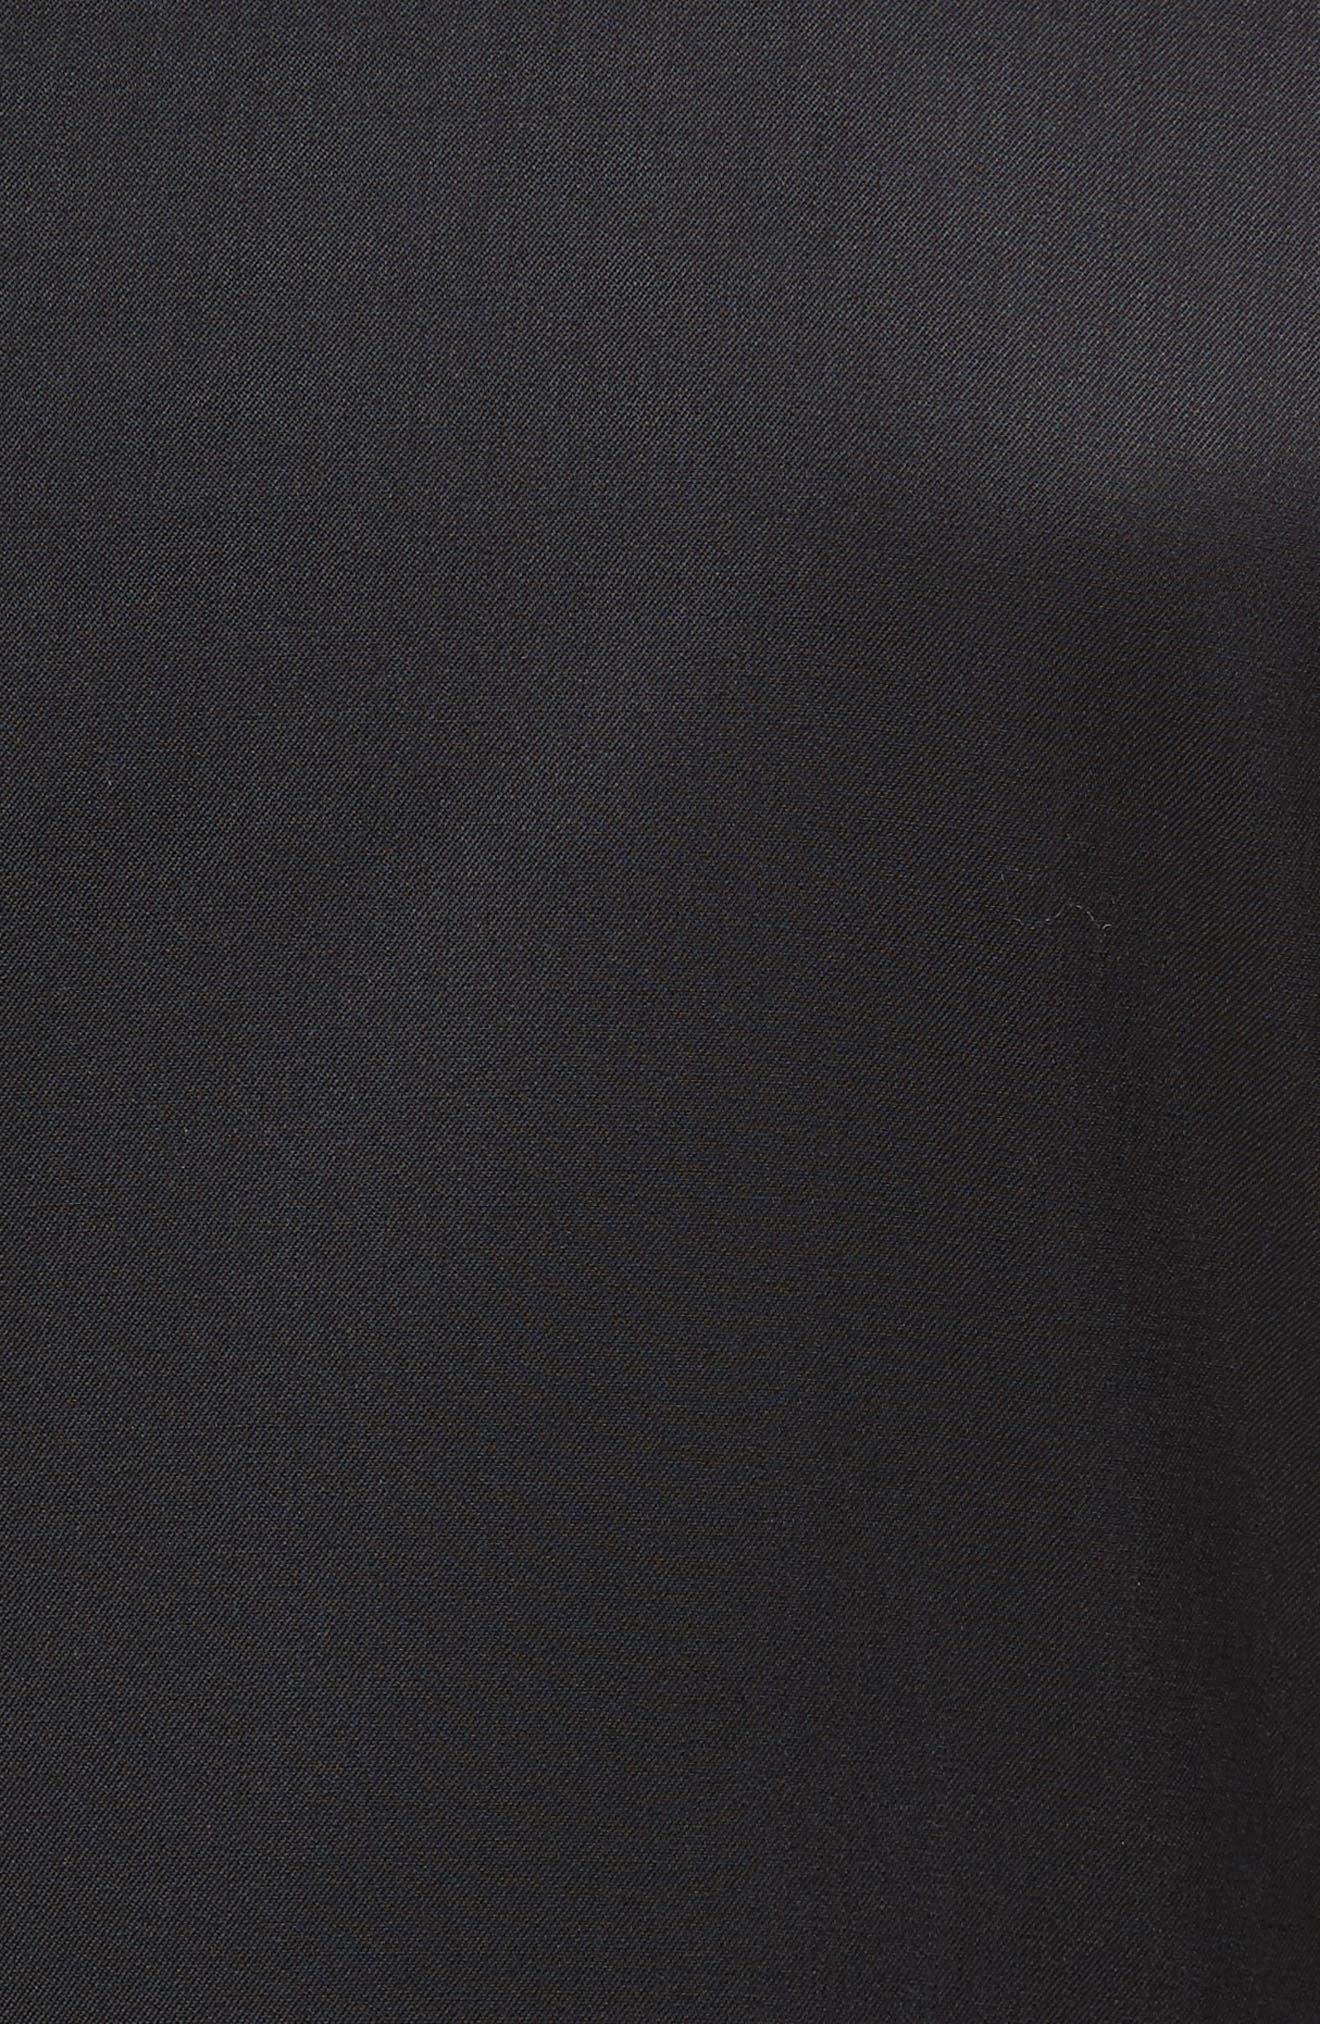 TED BAKER LONDON, Josh Trim Fit Wool & Mohair Tuxedo, Alternate thumbnail 7, color, BLACK